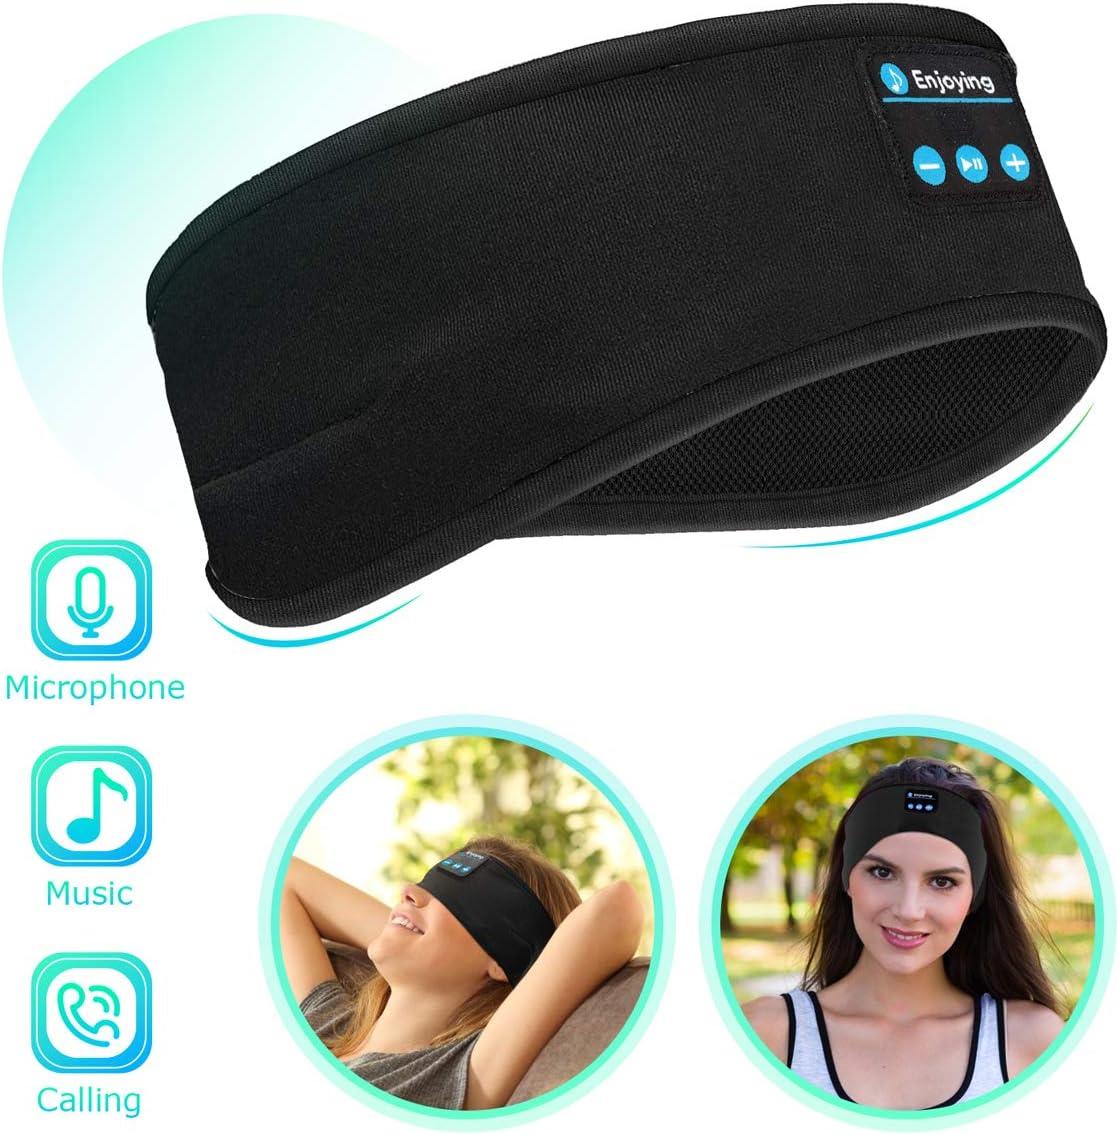 Bluetooth Sleep Headphones Eye Mask, Wireless Sports Headband Headphones with Detachable Stereo Thin Speaker for Sleeping, Sports, Meditation Relax, Sports Headband Black